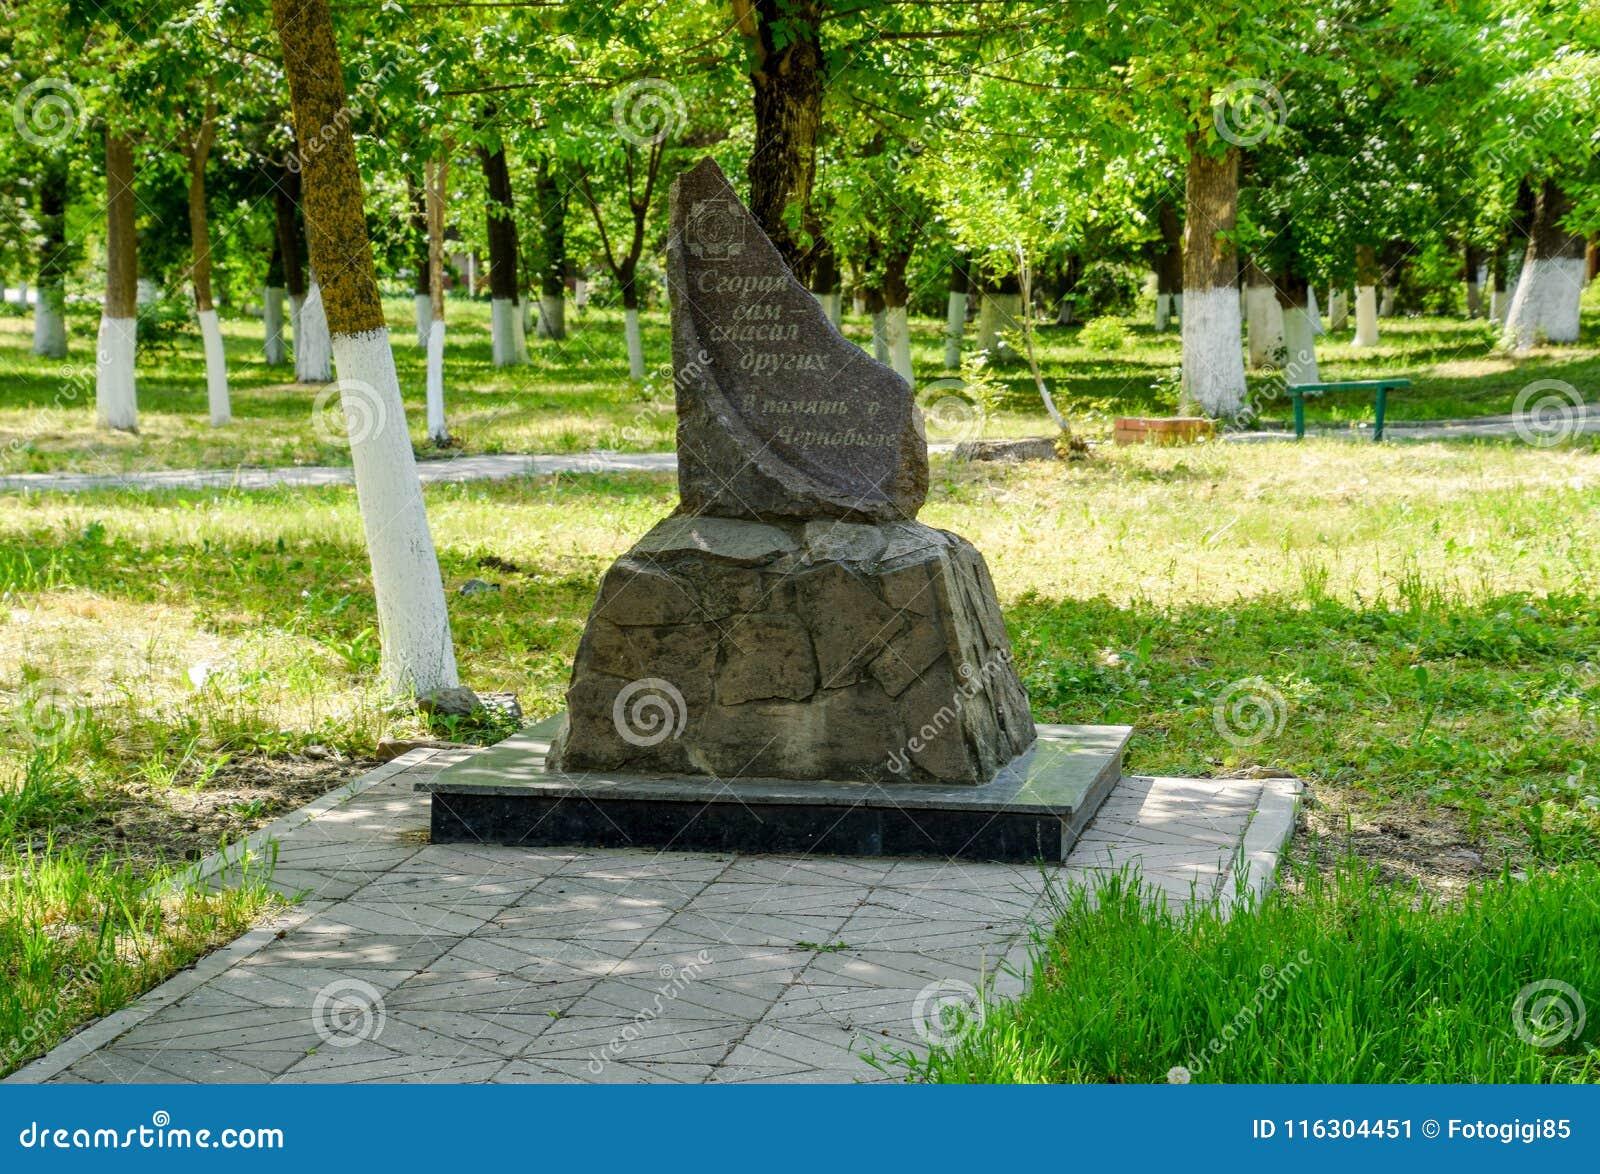 Monument to the liquidators of the Chernobyl accident in the village Staronizhesteblyevskaya in the park.